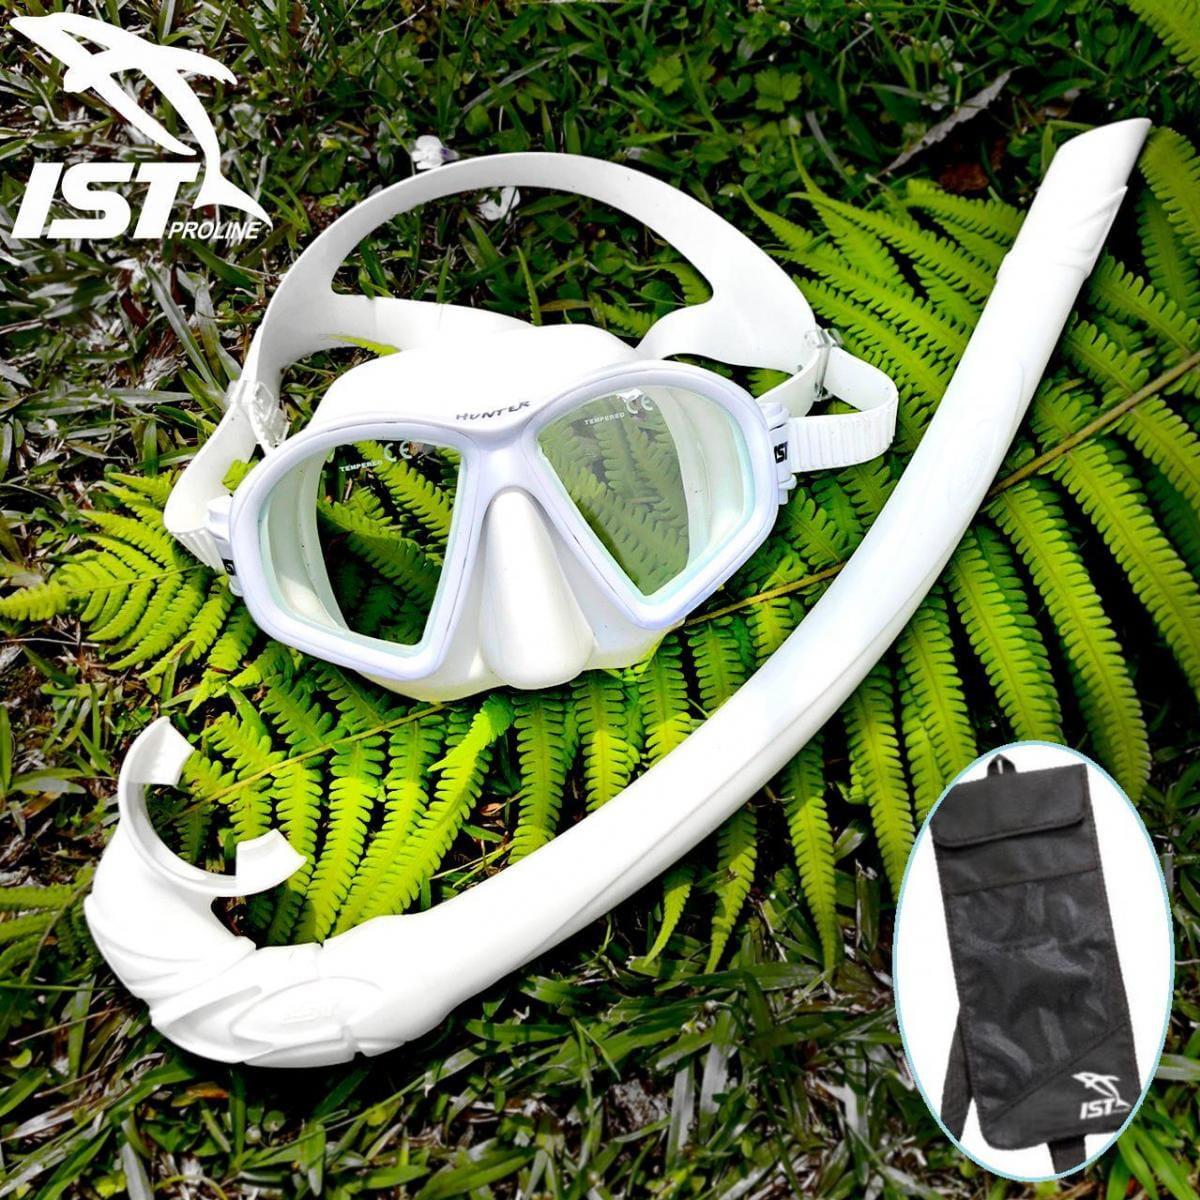 CS36 - HUNTER自由潛水新手套組 - 加贈環保網袋